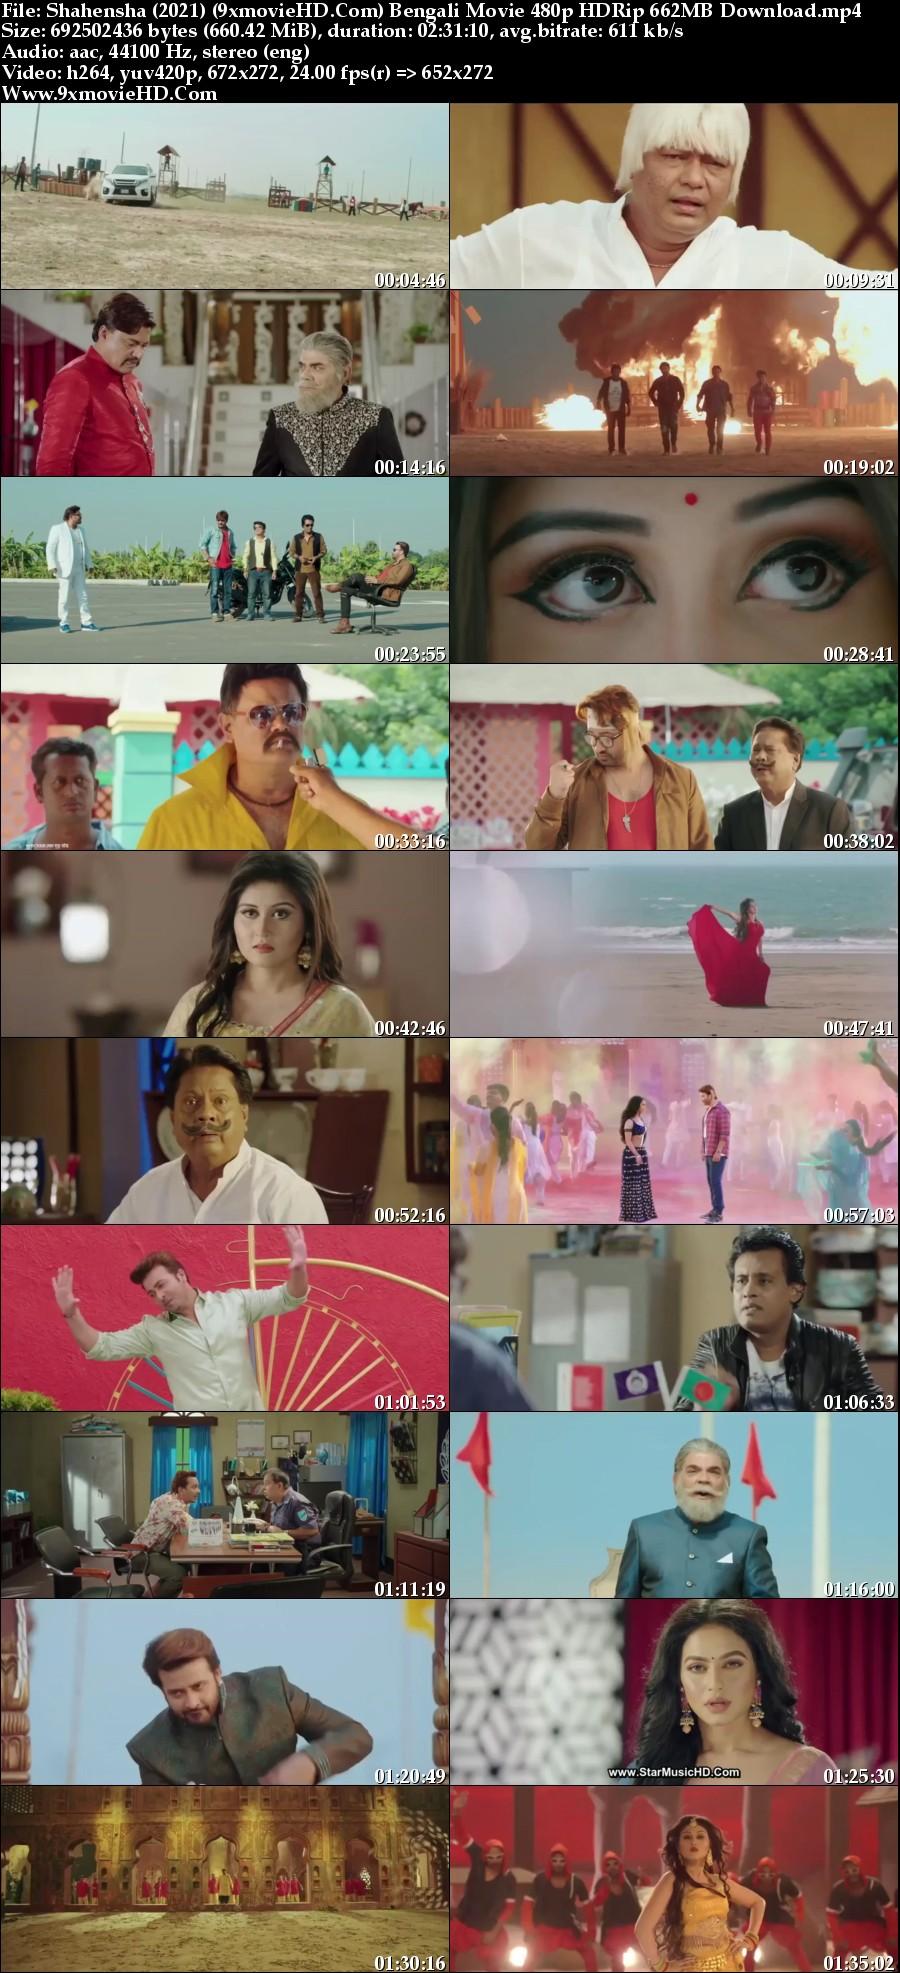 Shahensha-2021-9xmovie-HD-Com-Bengali-Movie-480p-HDRip-662-MB-Download